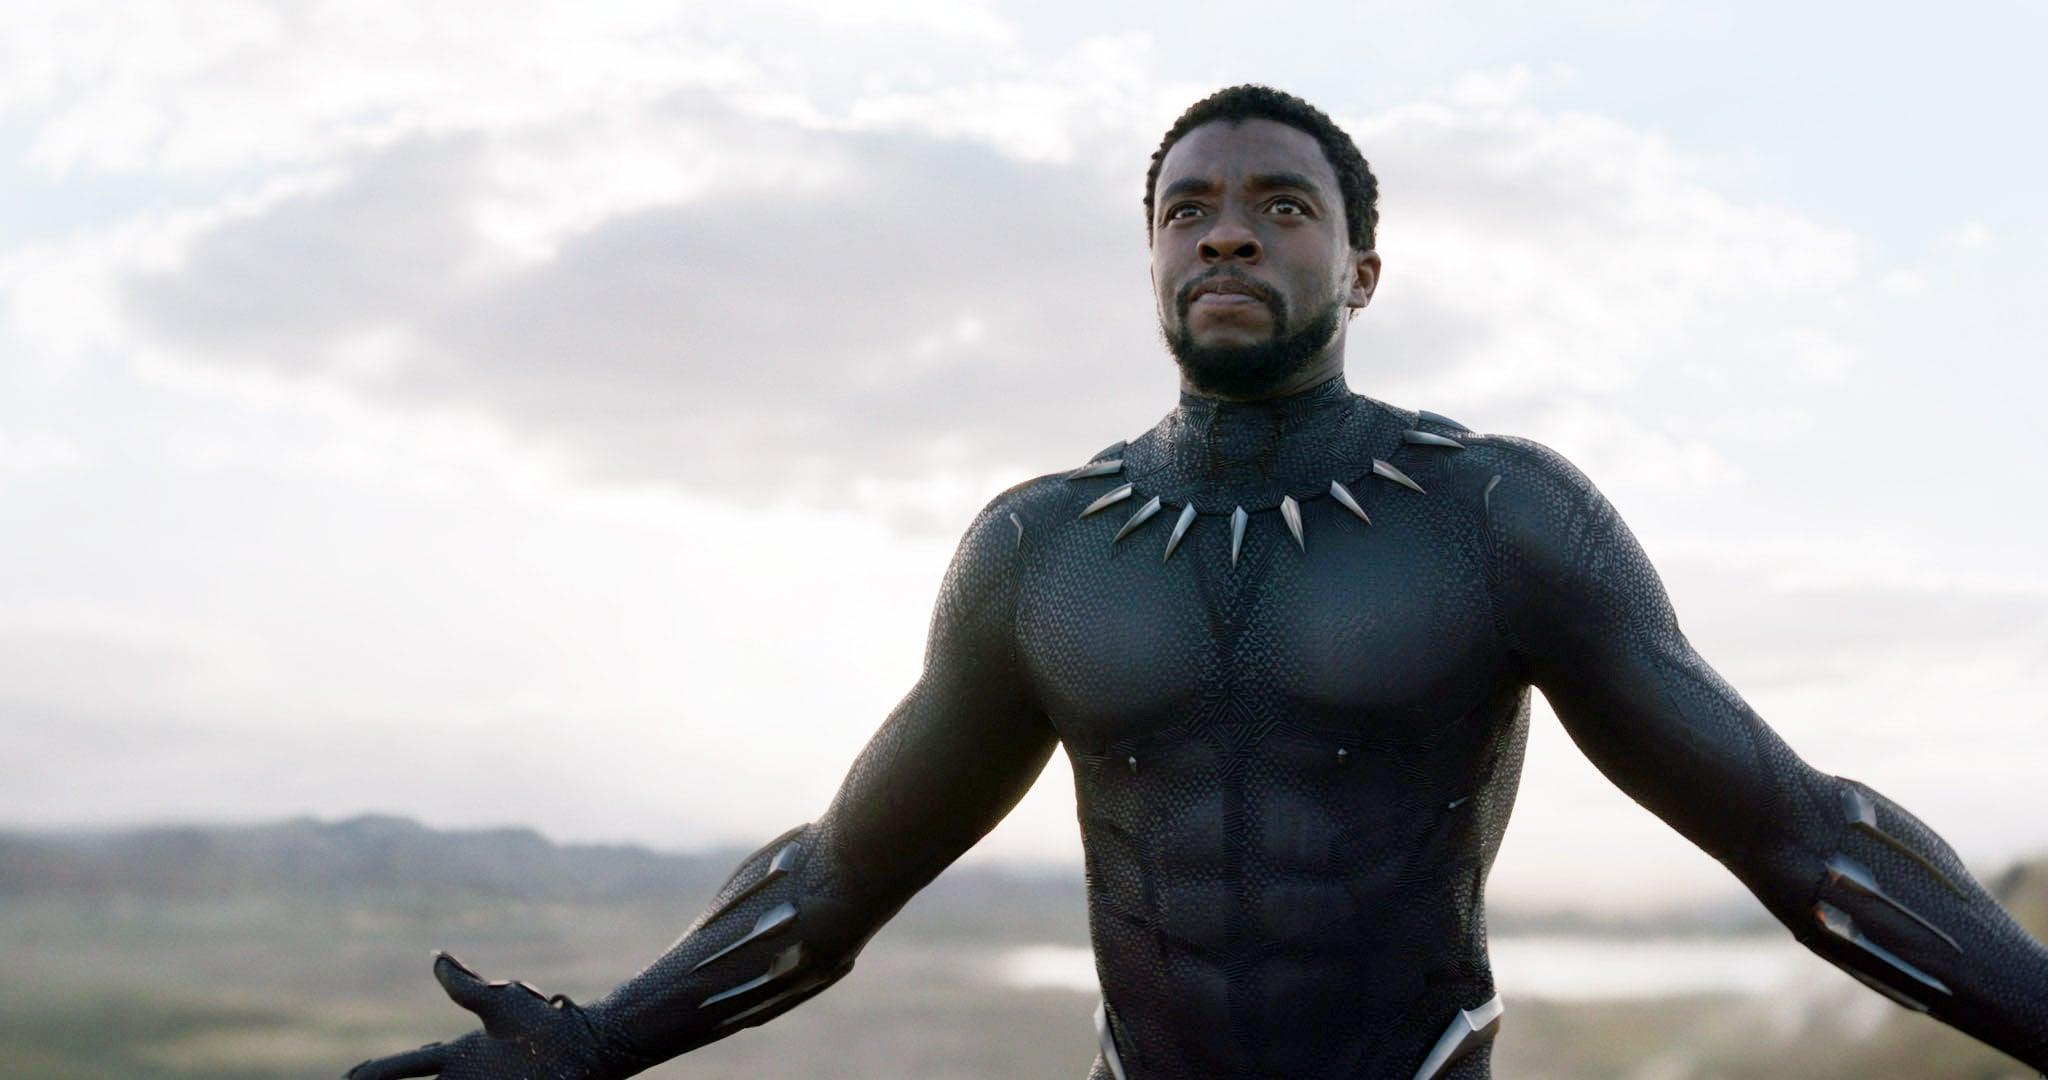 Chadwick Boseman: momentos chaves do nosso eterno Pantera Negra